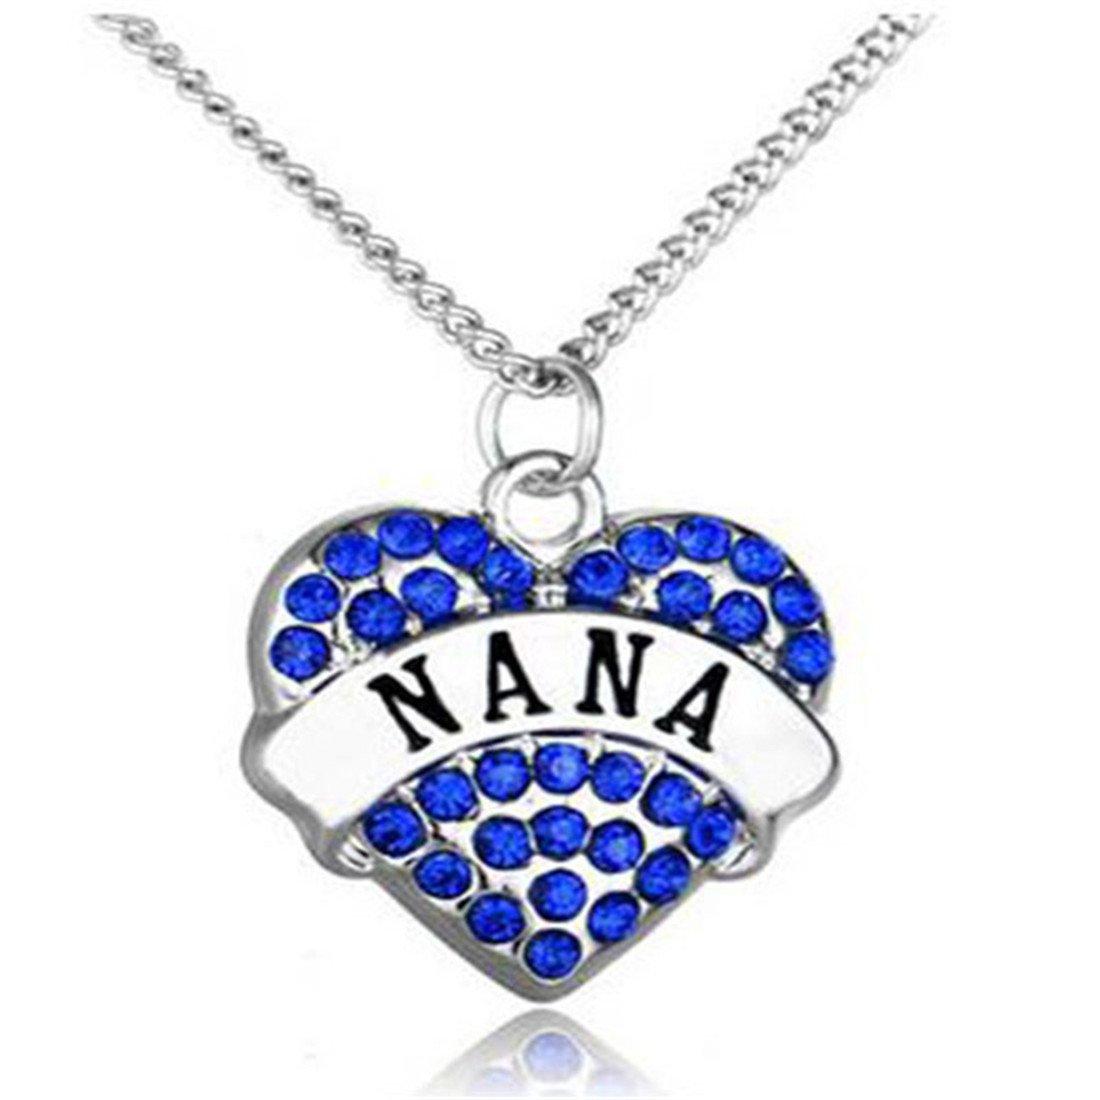 RainBabe Necklace Love Heart Shape Letter Print Rhinestone Pendent Necklace 1Pc (Blue Nana)